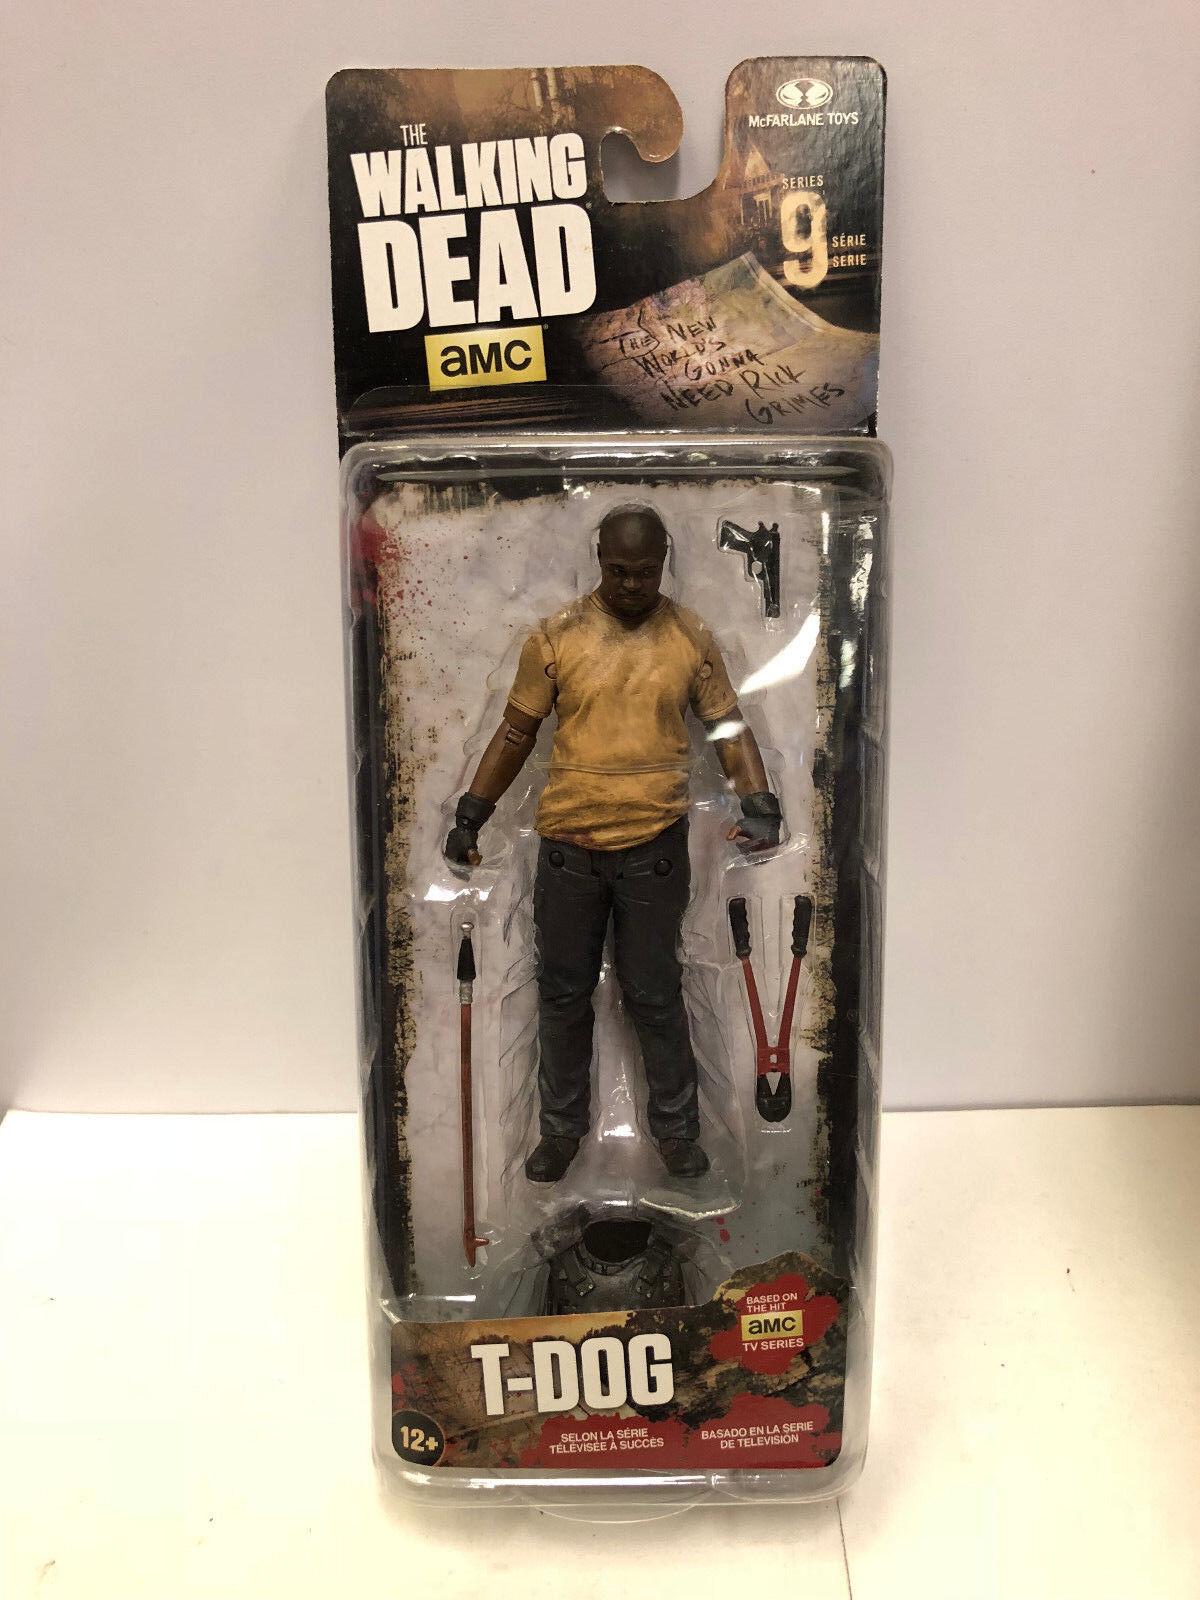 The Walking Dead Tv Figur Serie 9 T-Dog Figur Tv Mcfarlane Toys 2016 0a73d1